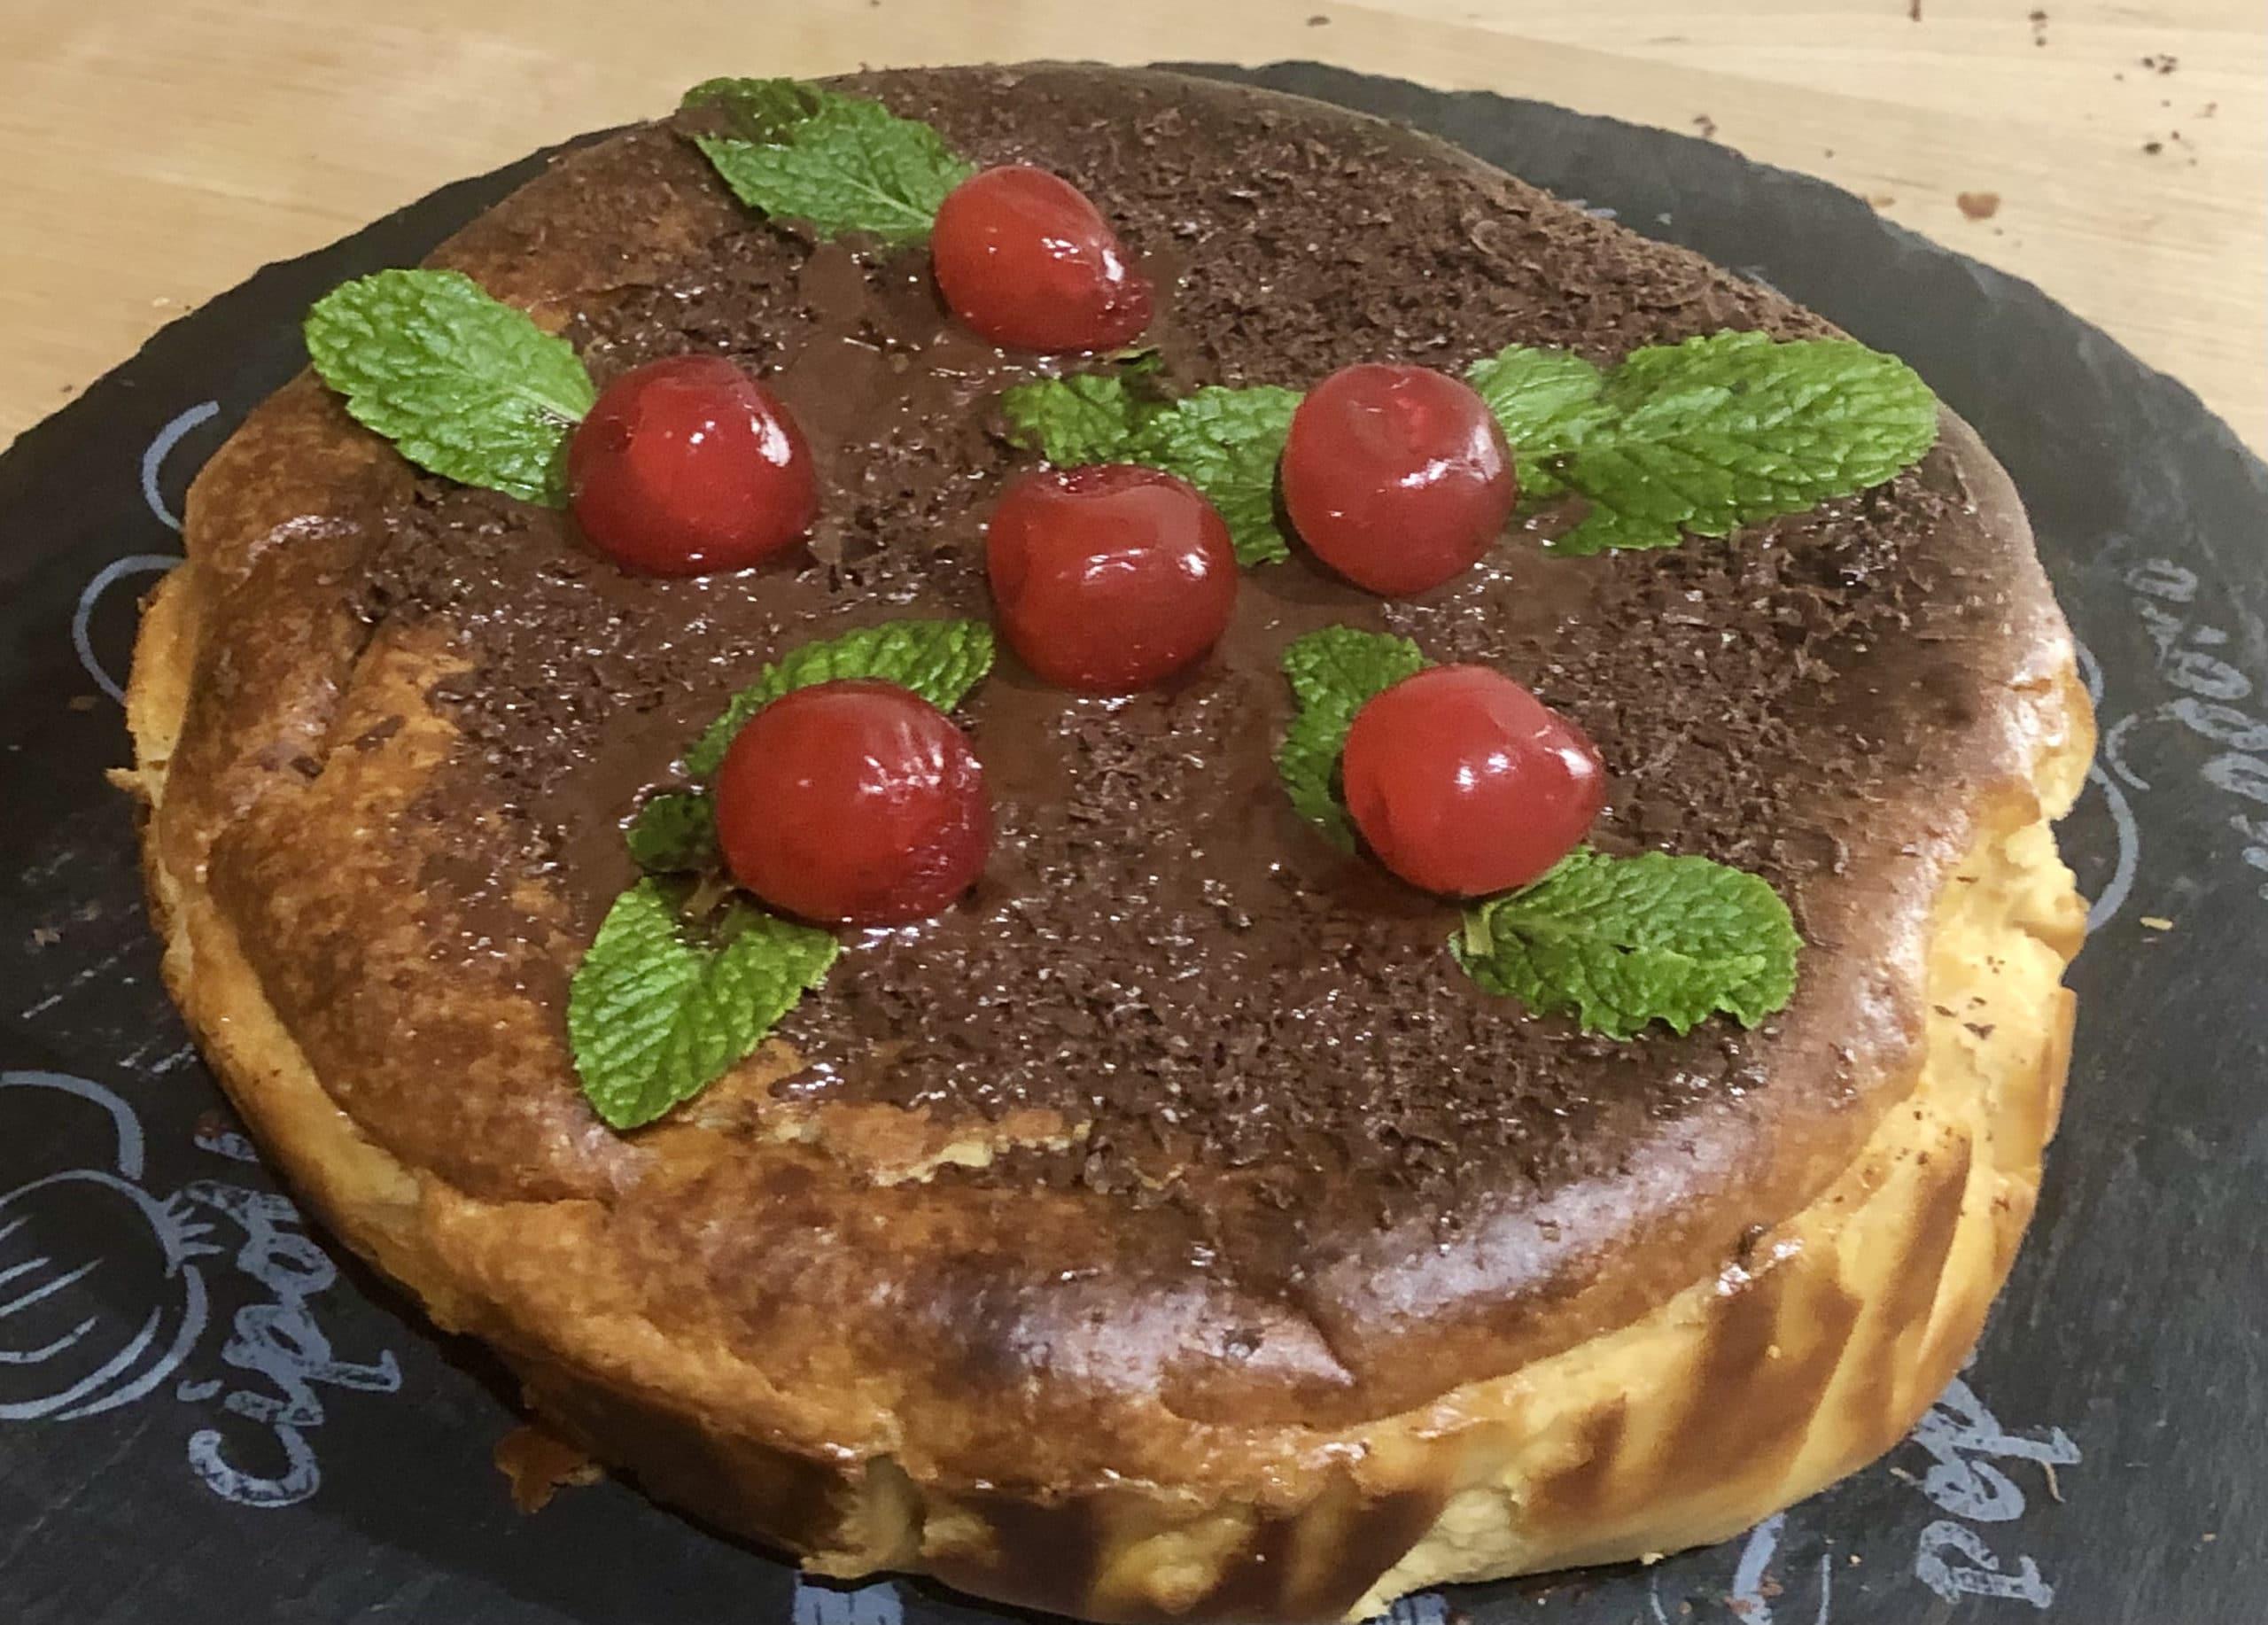 Delicioso cheesecake de turrón